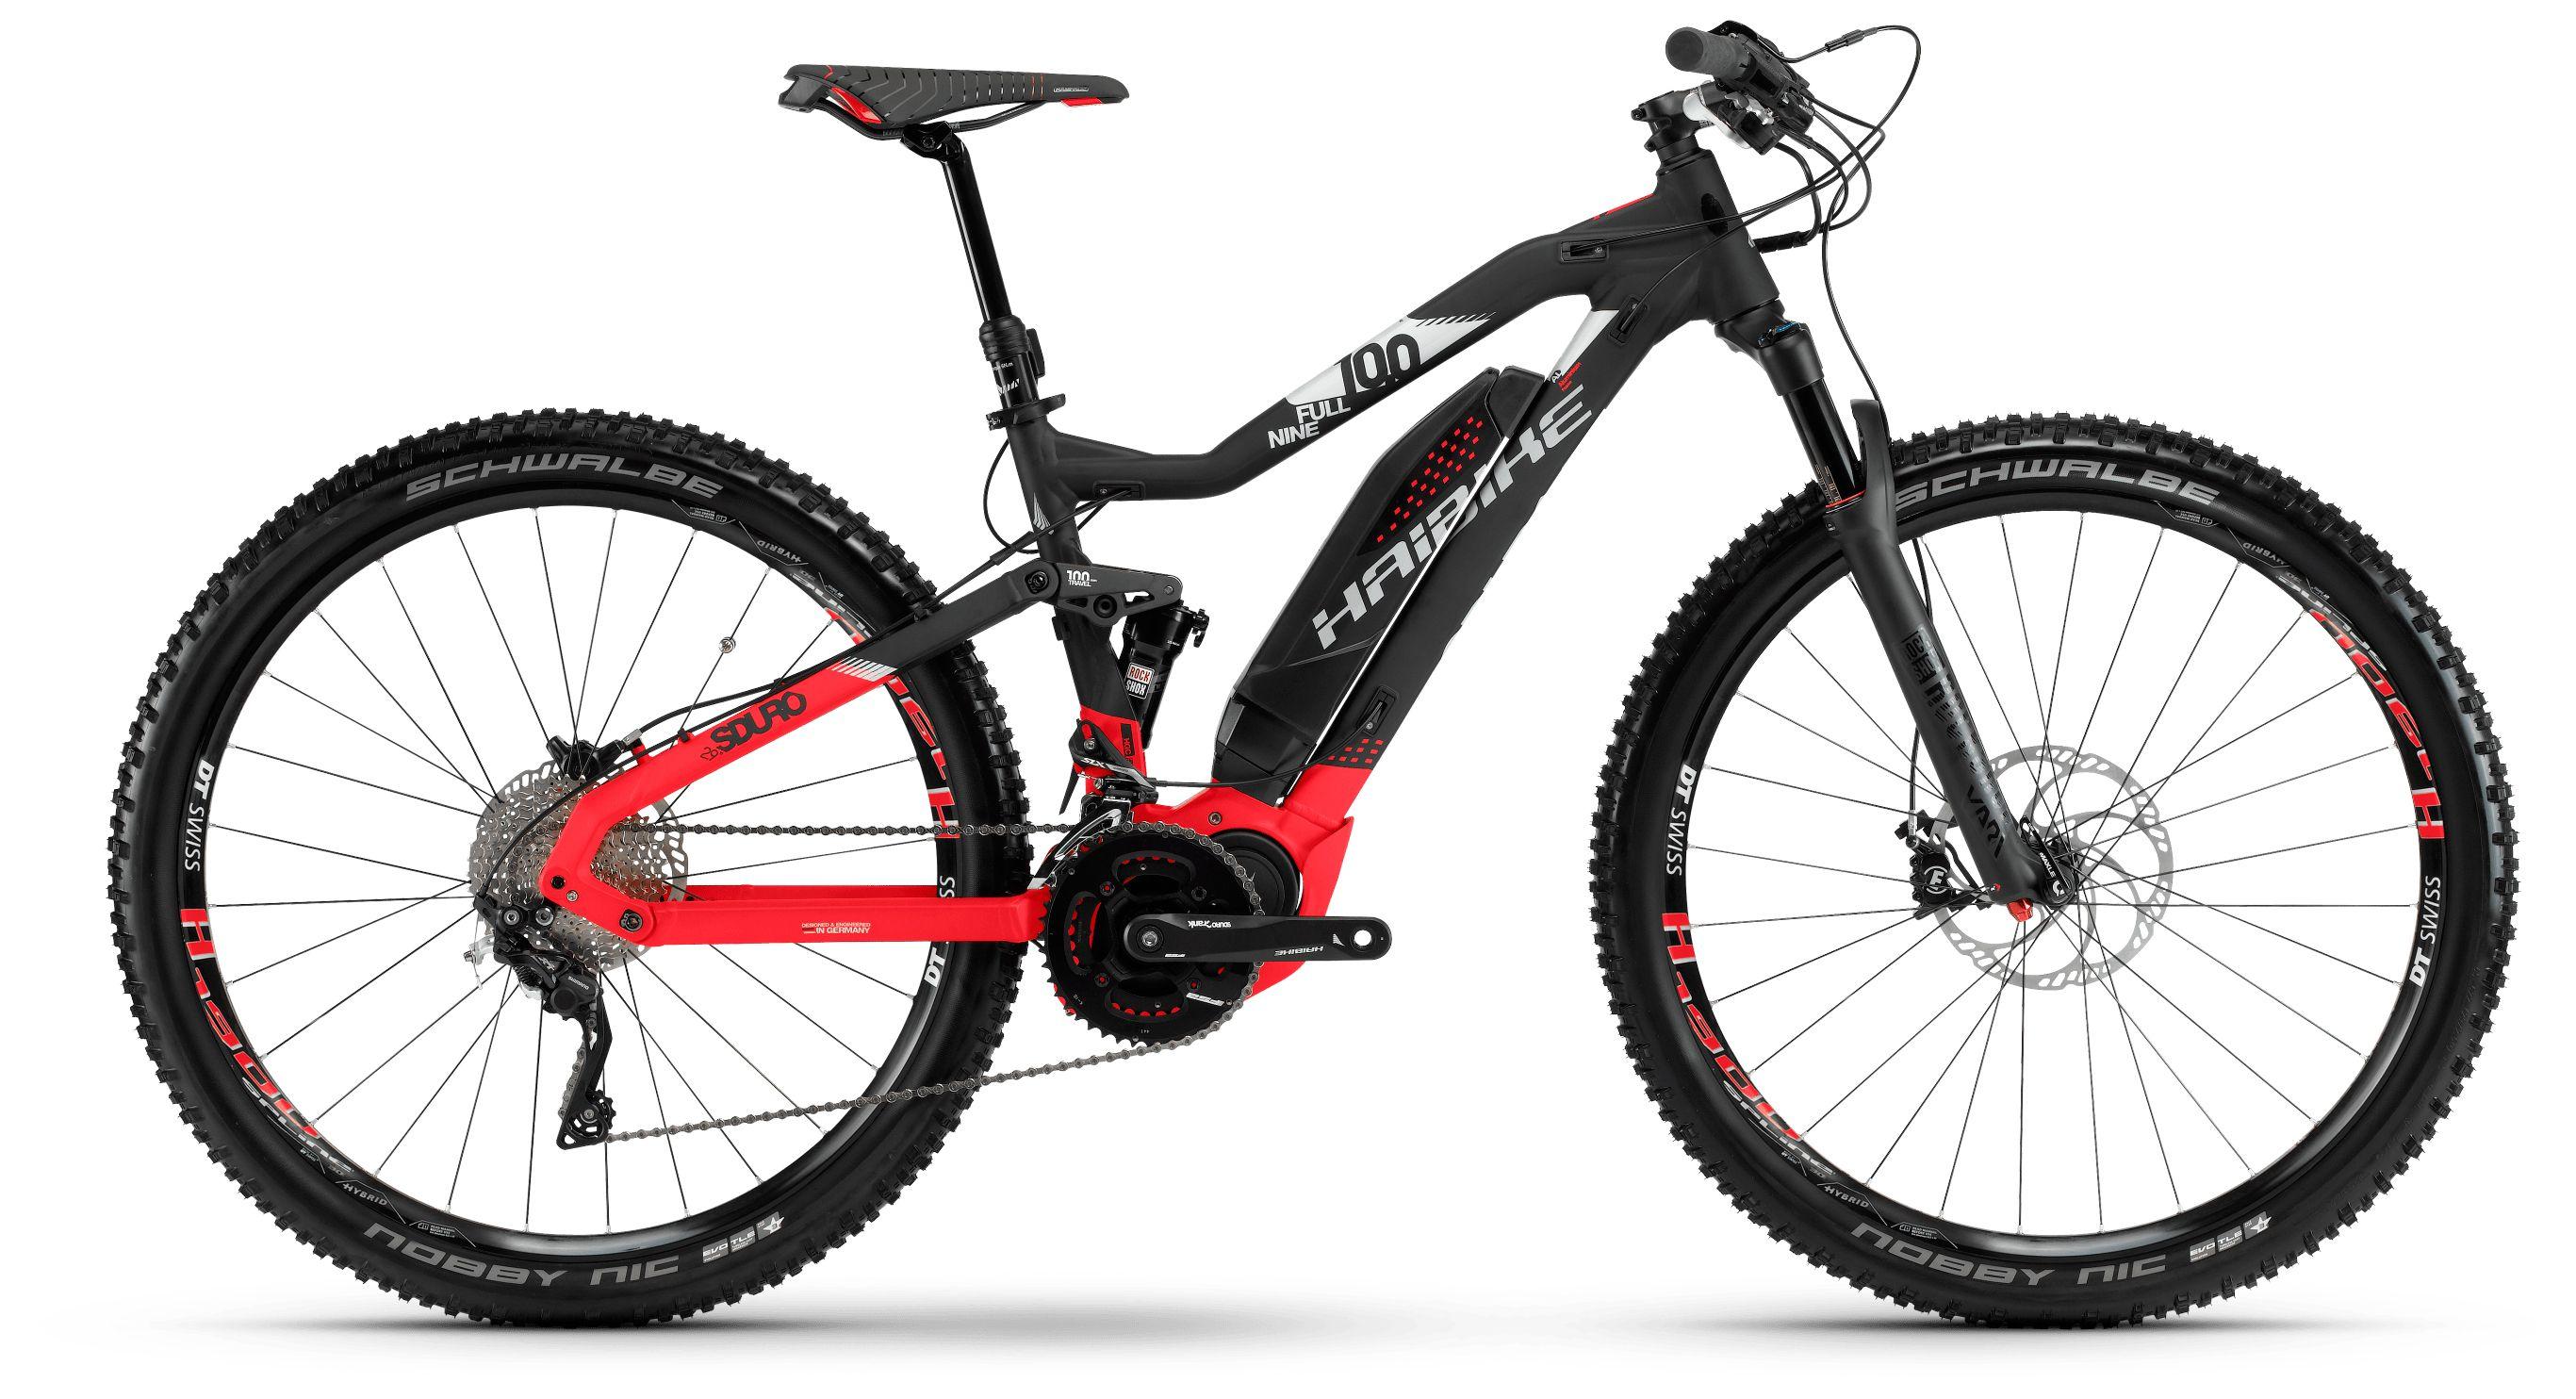 Велосипед Haibike Sduro FullNine 10.0 500Wh 20s XT 2018 велосипед haibike xduro race 2015